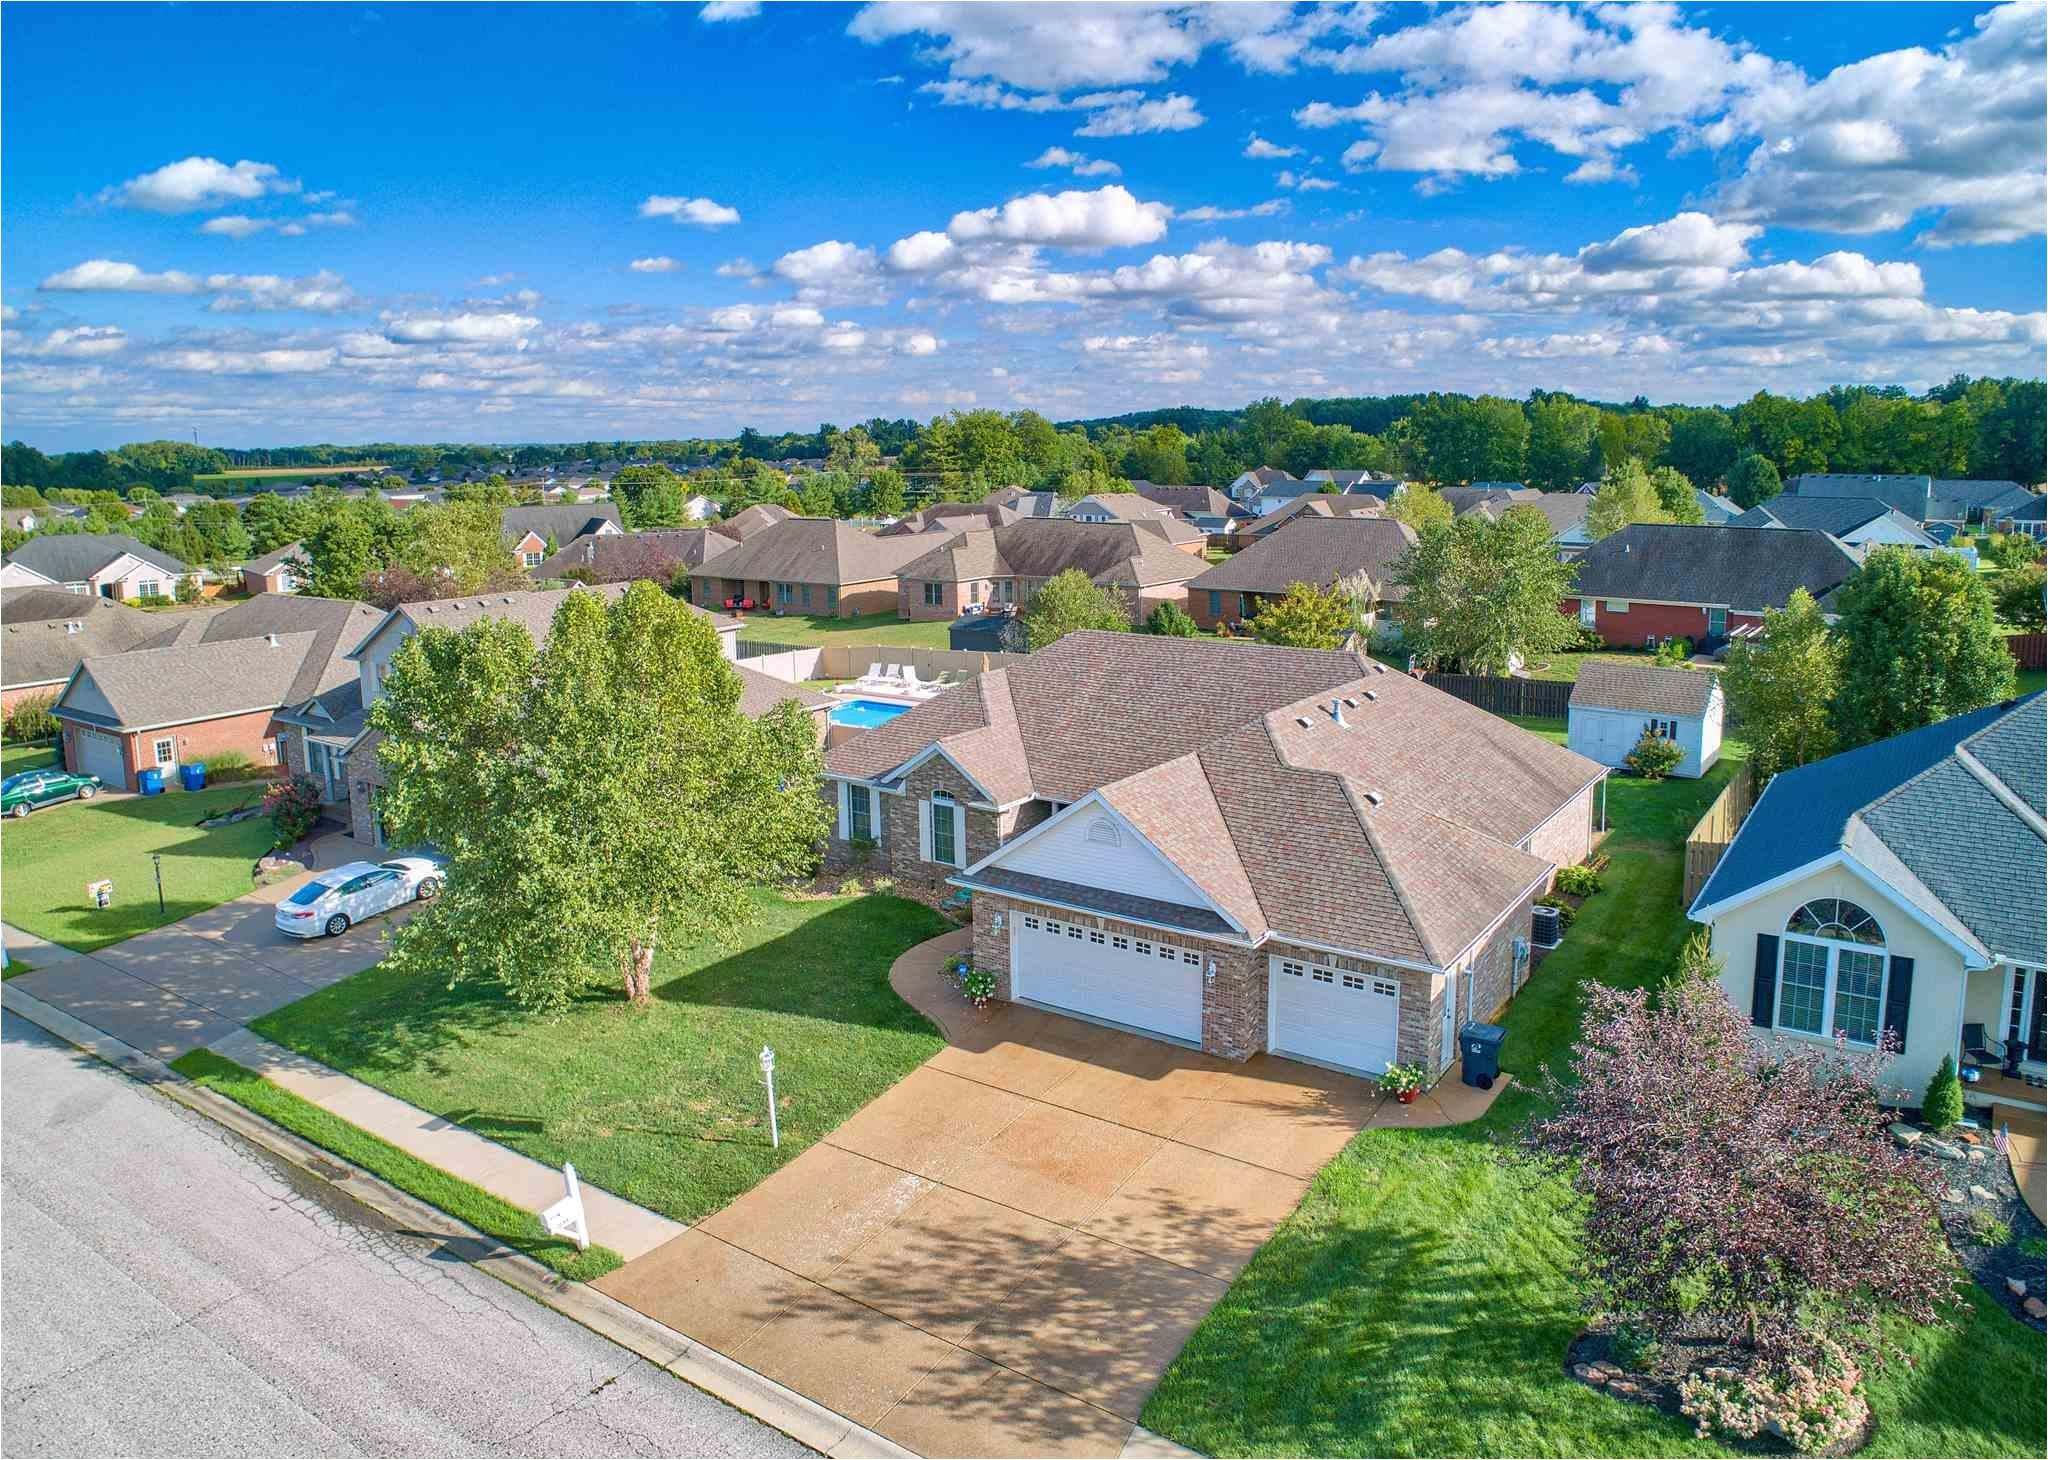 property photo property photo property photo